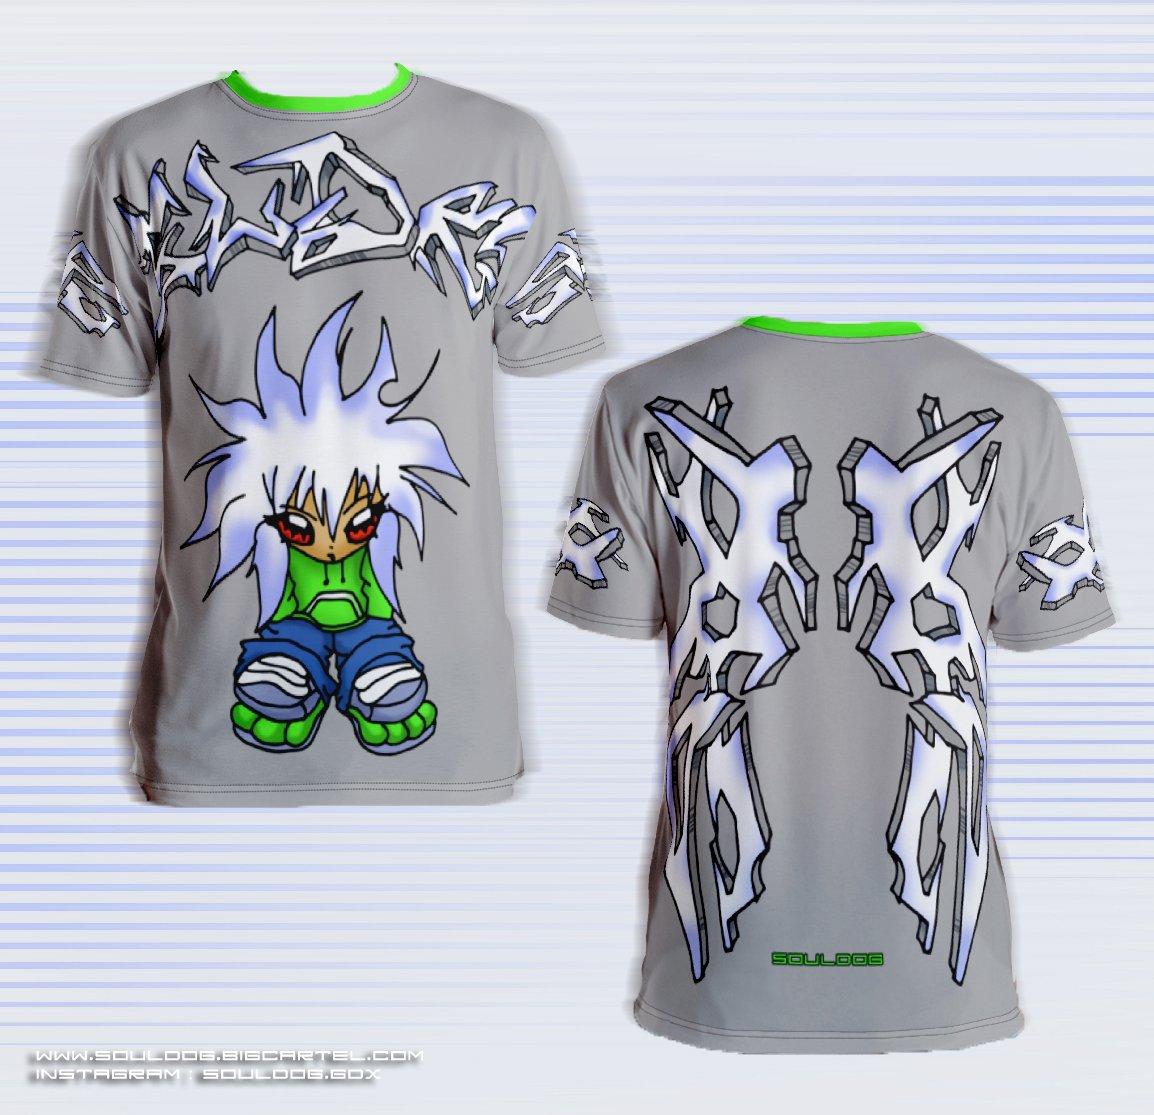 Image of Lox (Liquid Oxigen) T-shirt